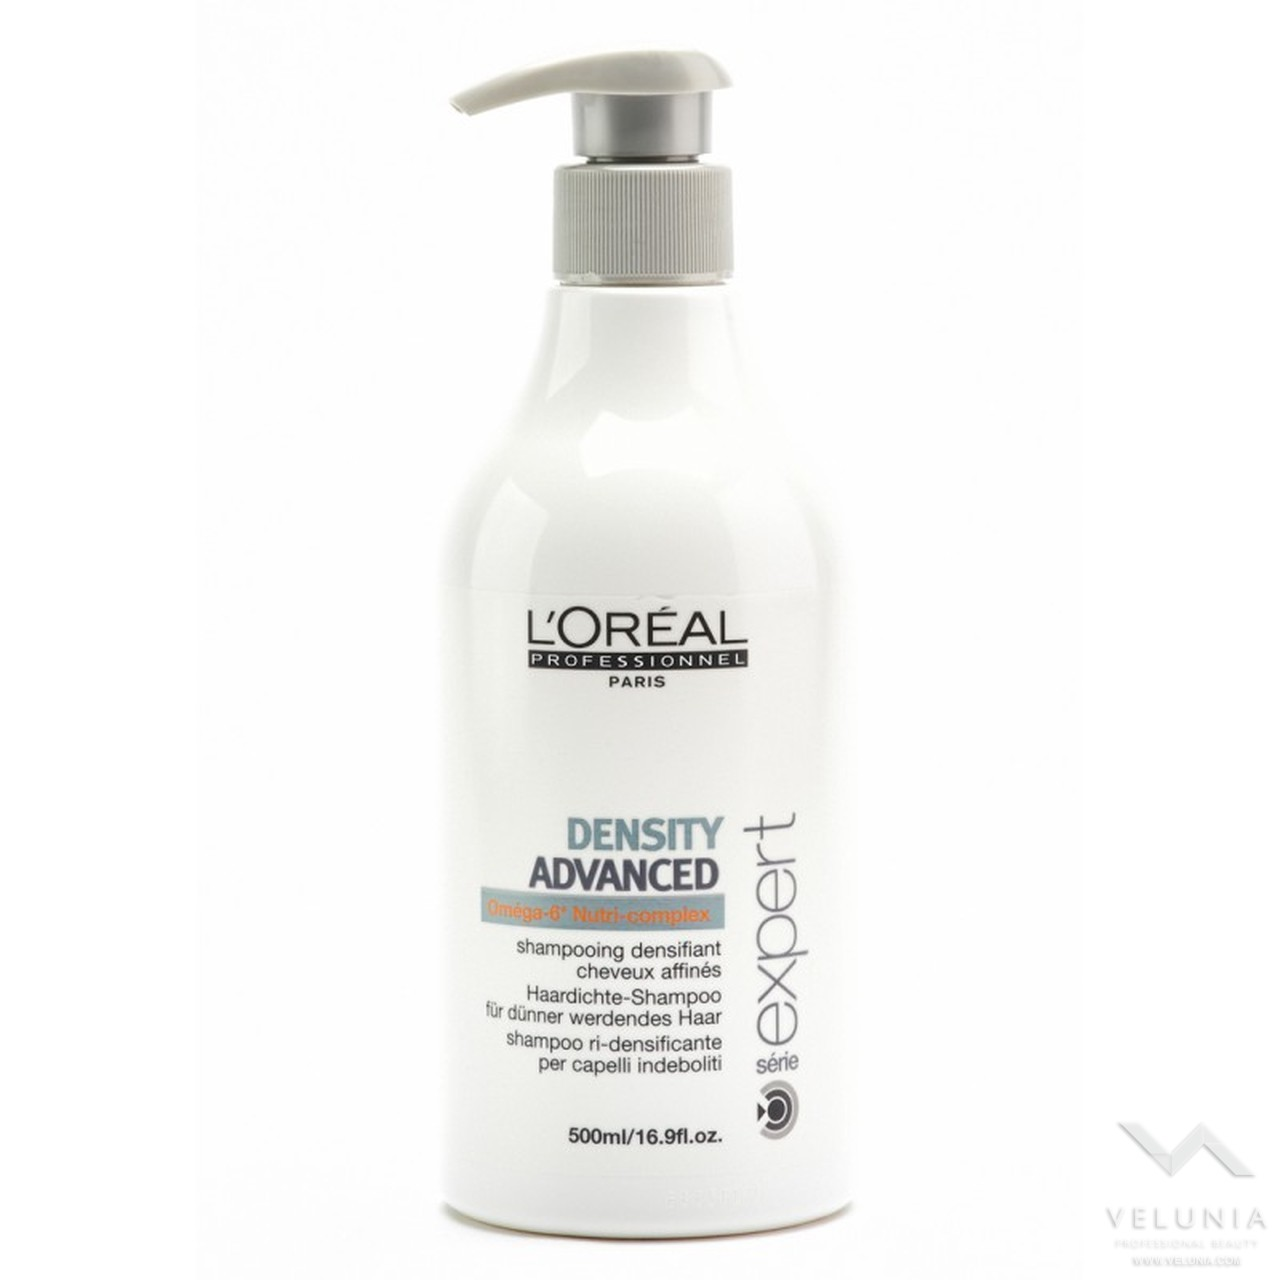 L'Oreal Expert Density Advanced 500ml 1